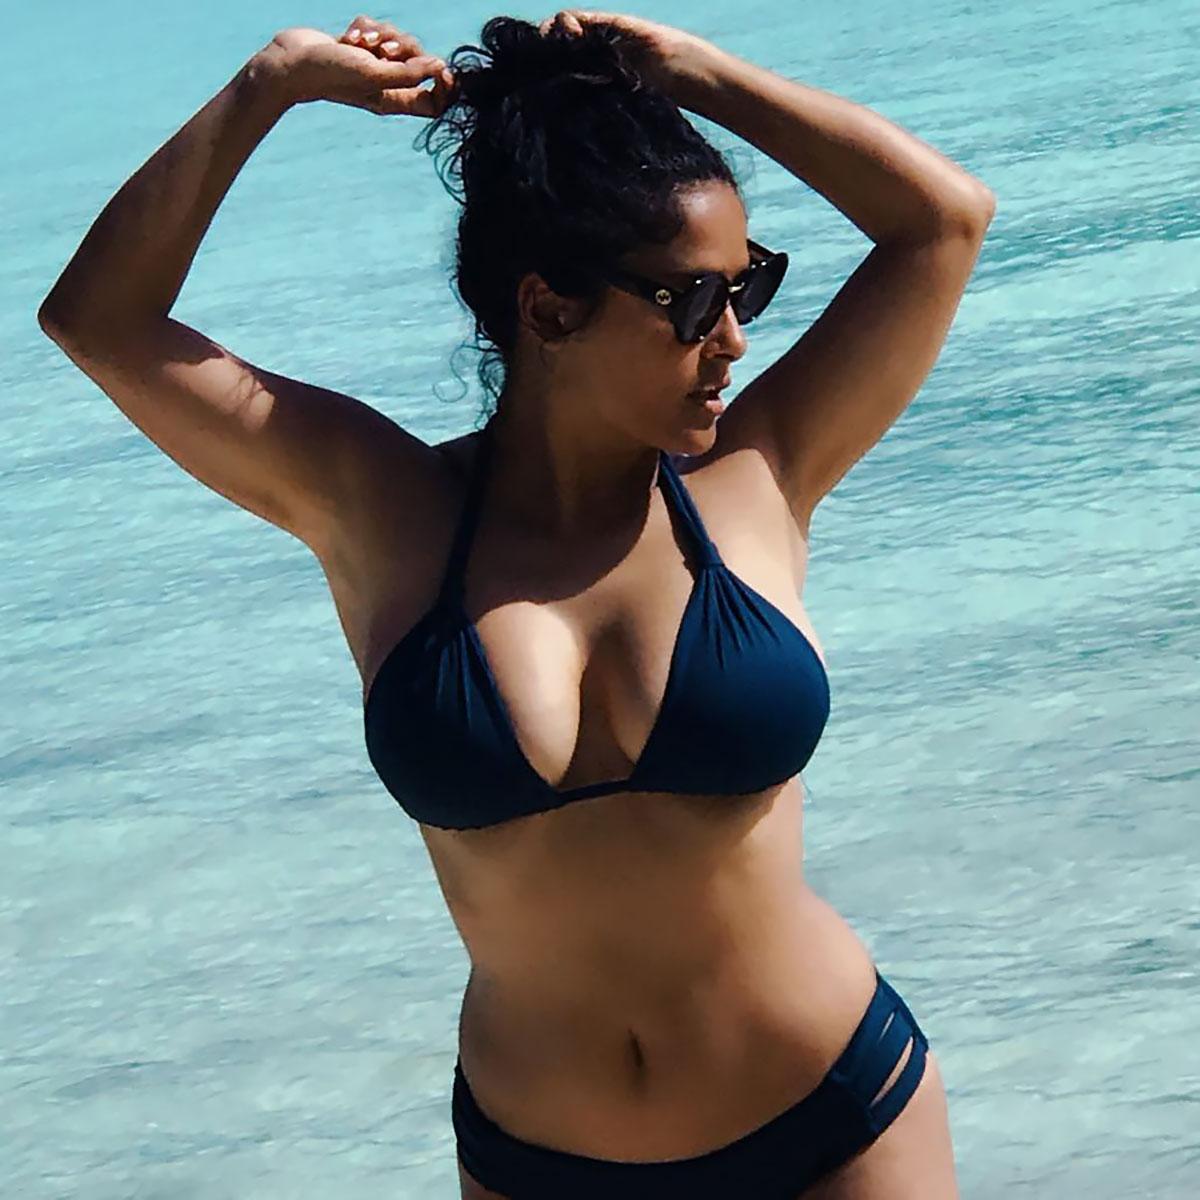 Salma-Hayek-Bikini-Body-Swim-Style-Slide